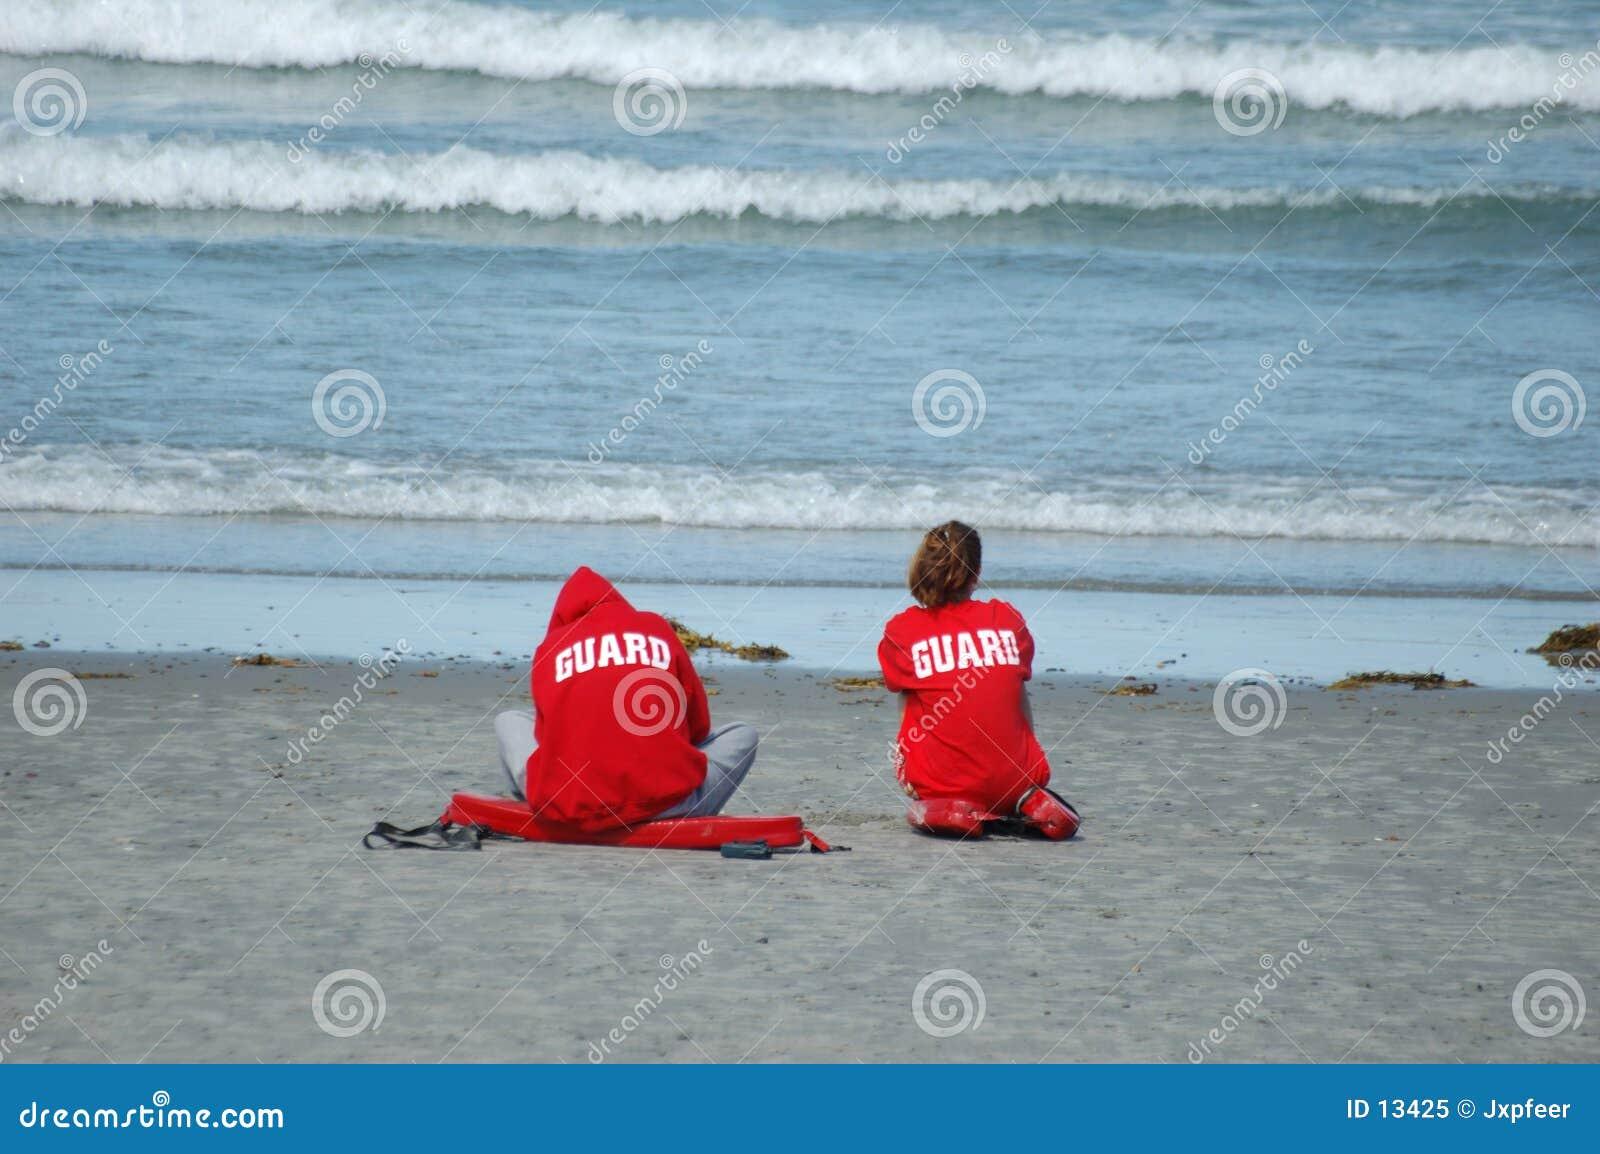 Strandlivräddarear